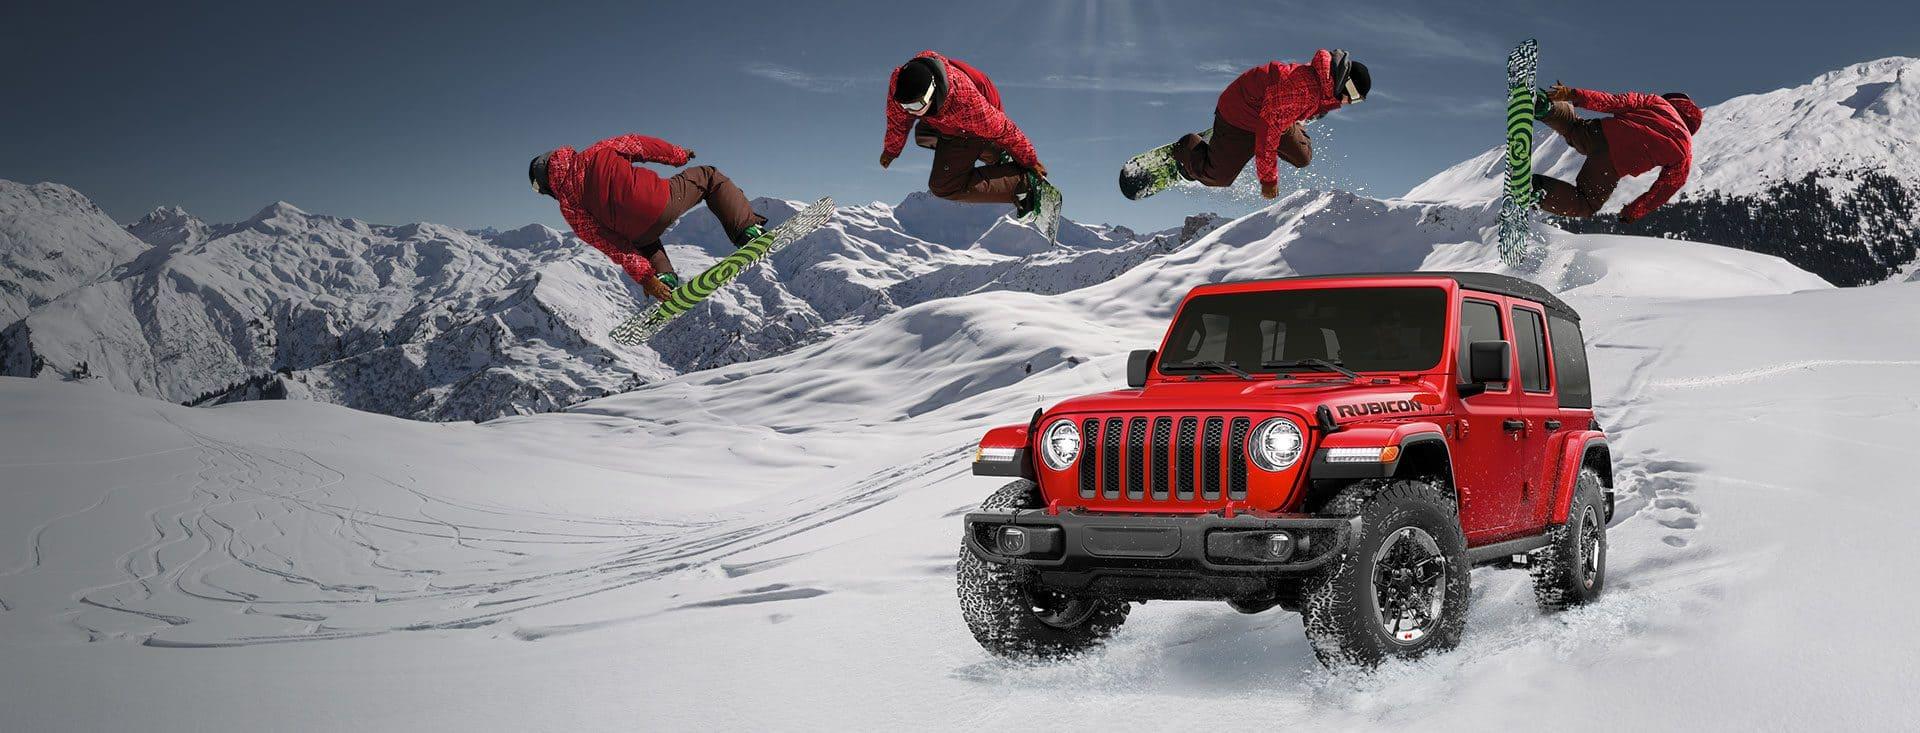 allnew 2018 jeep wrangler elevate your next adventure - 1920×733